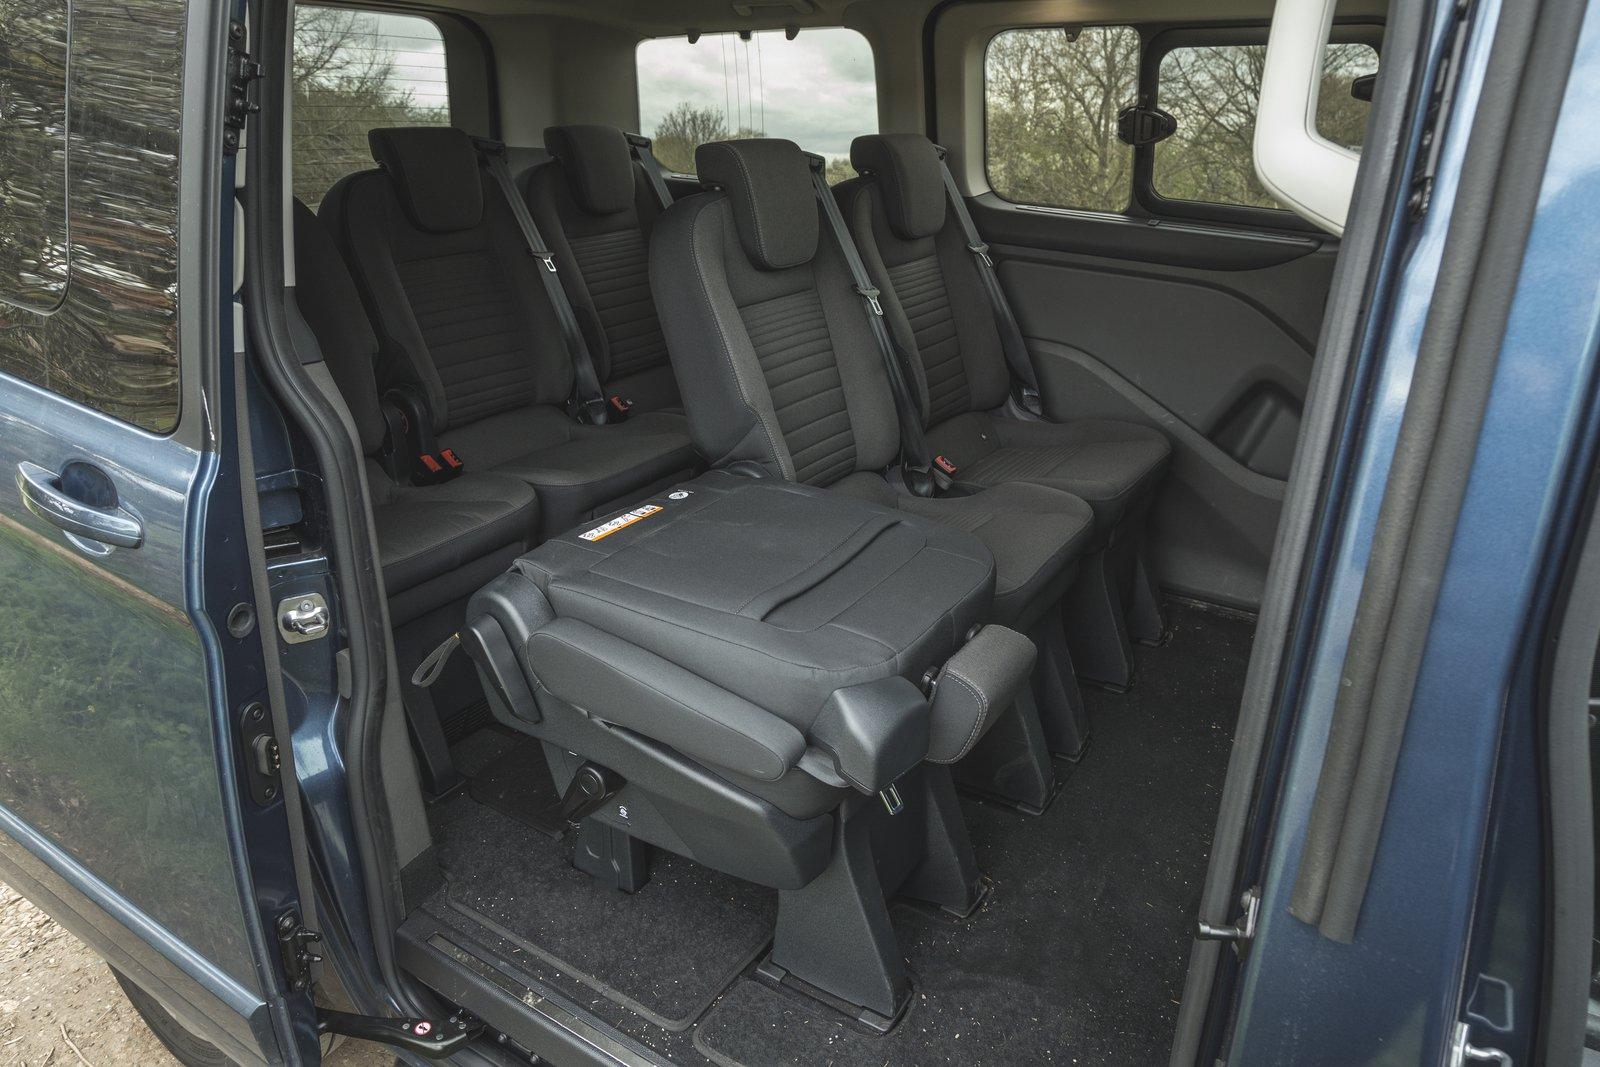 Ford Tourneo Custom 2021 interior rear seats